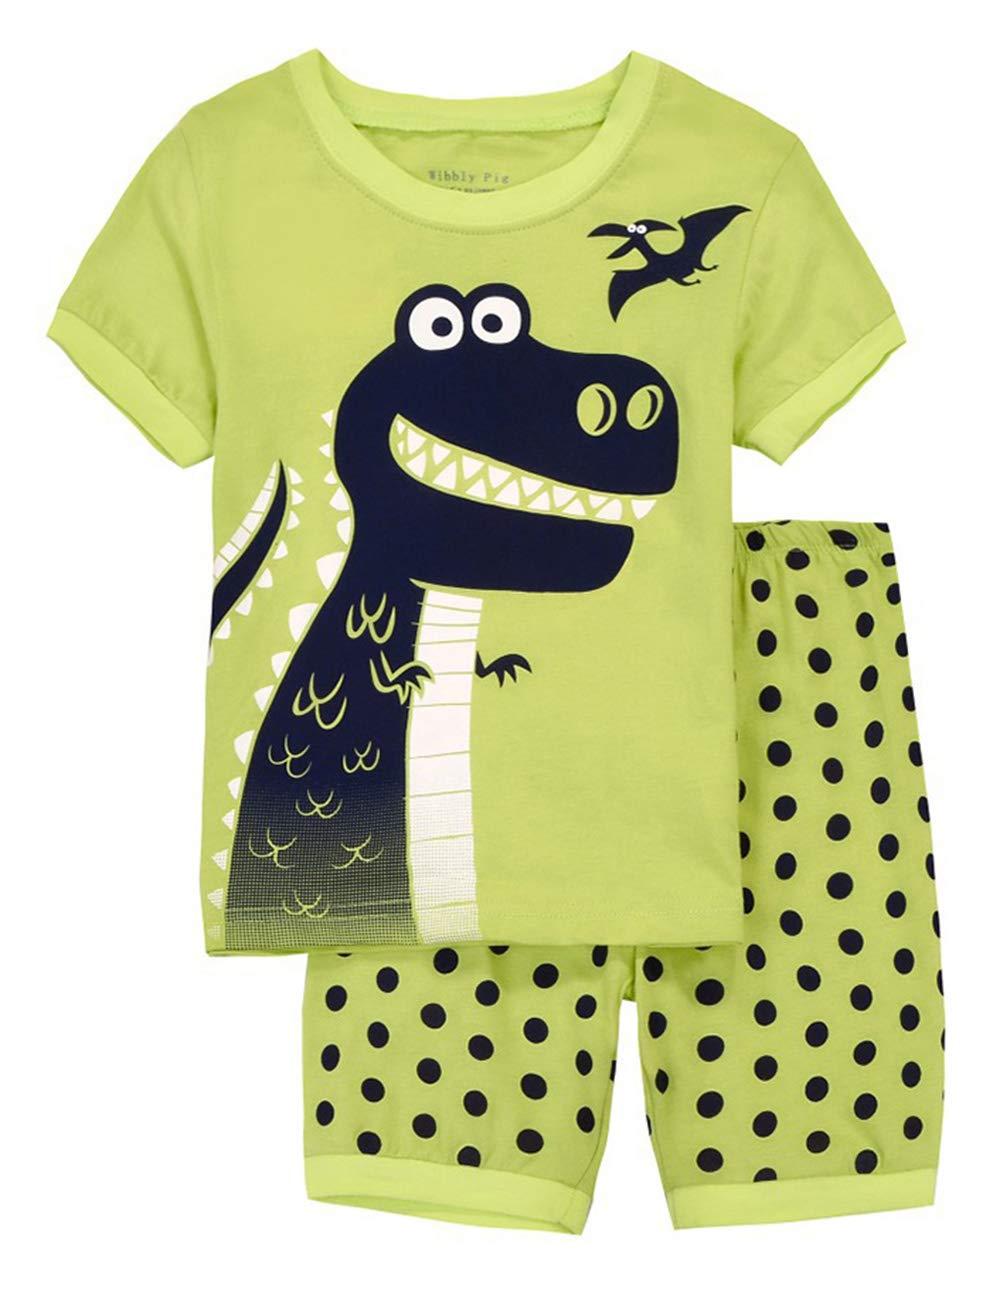 Boys Dinosaur Pajamas Kids 100% Cotton Halloween Christmas PJs Saurus Sleepwear Sets